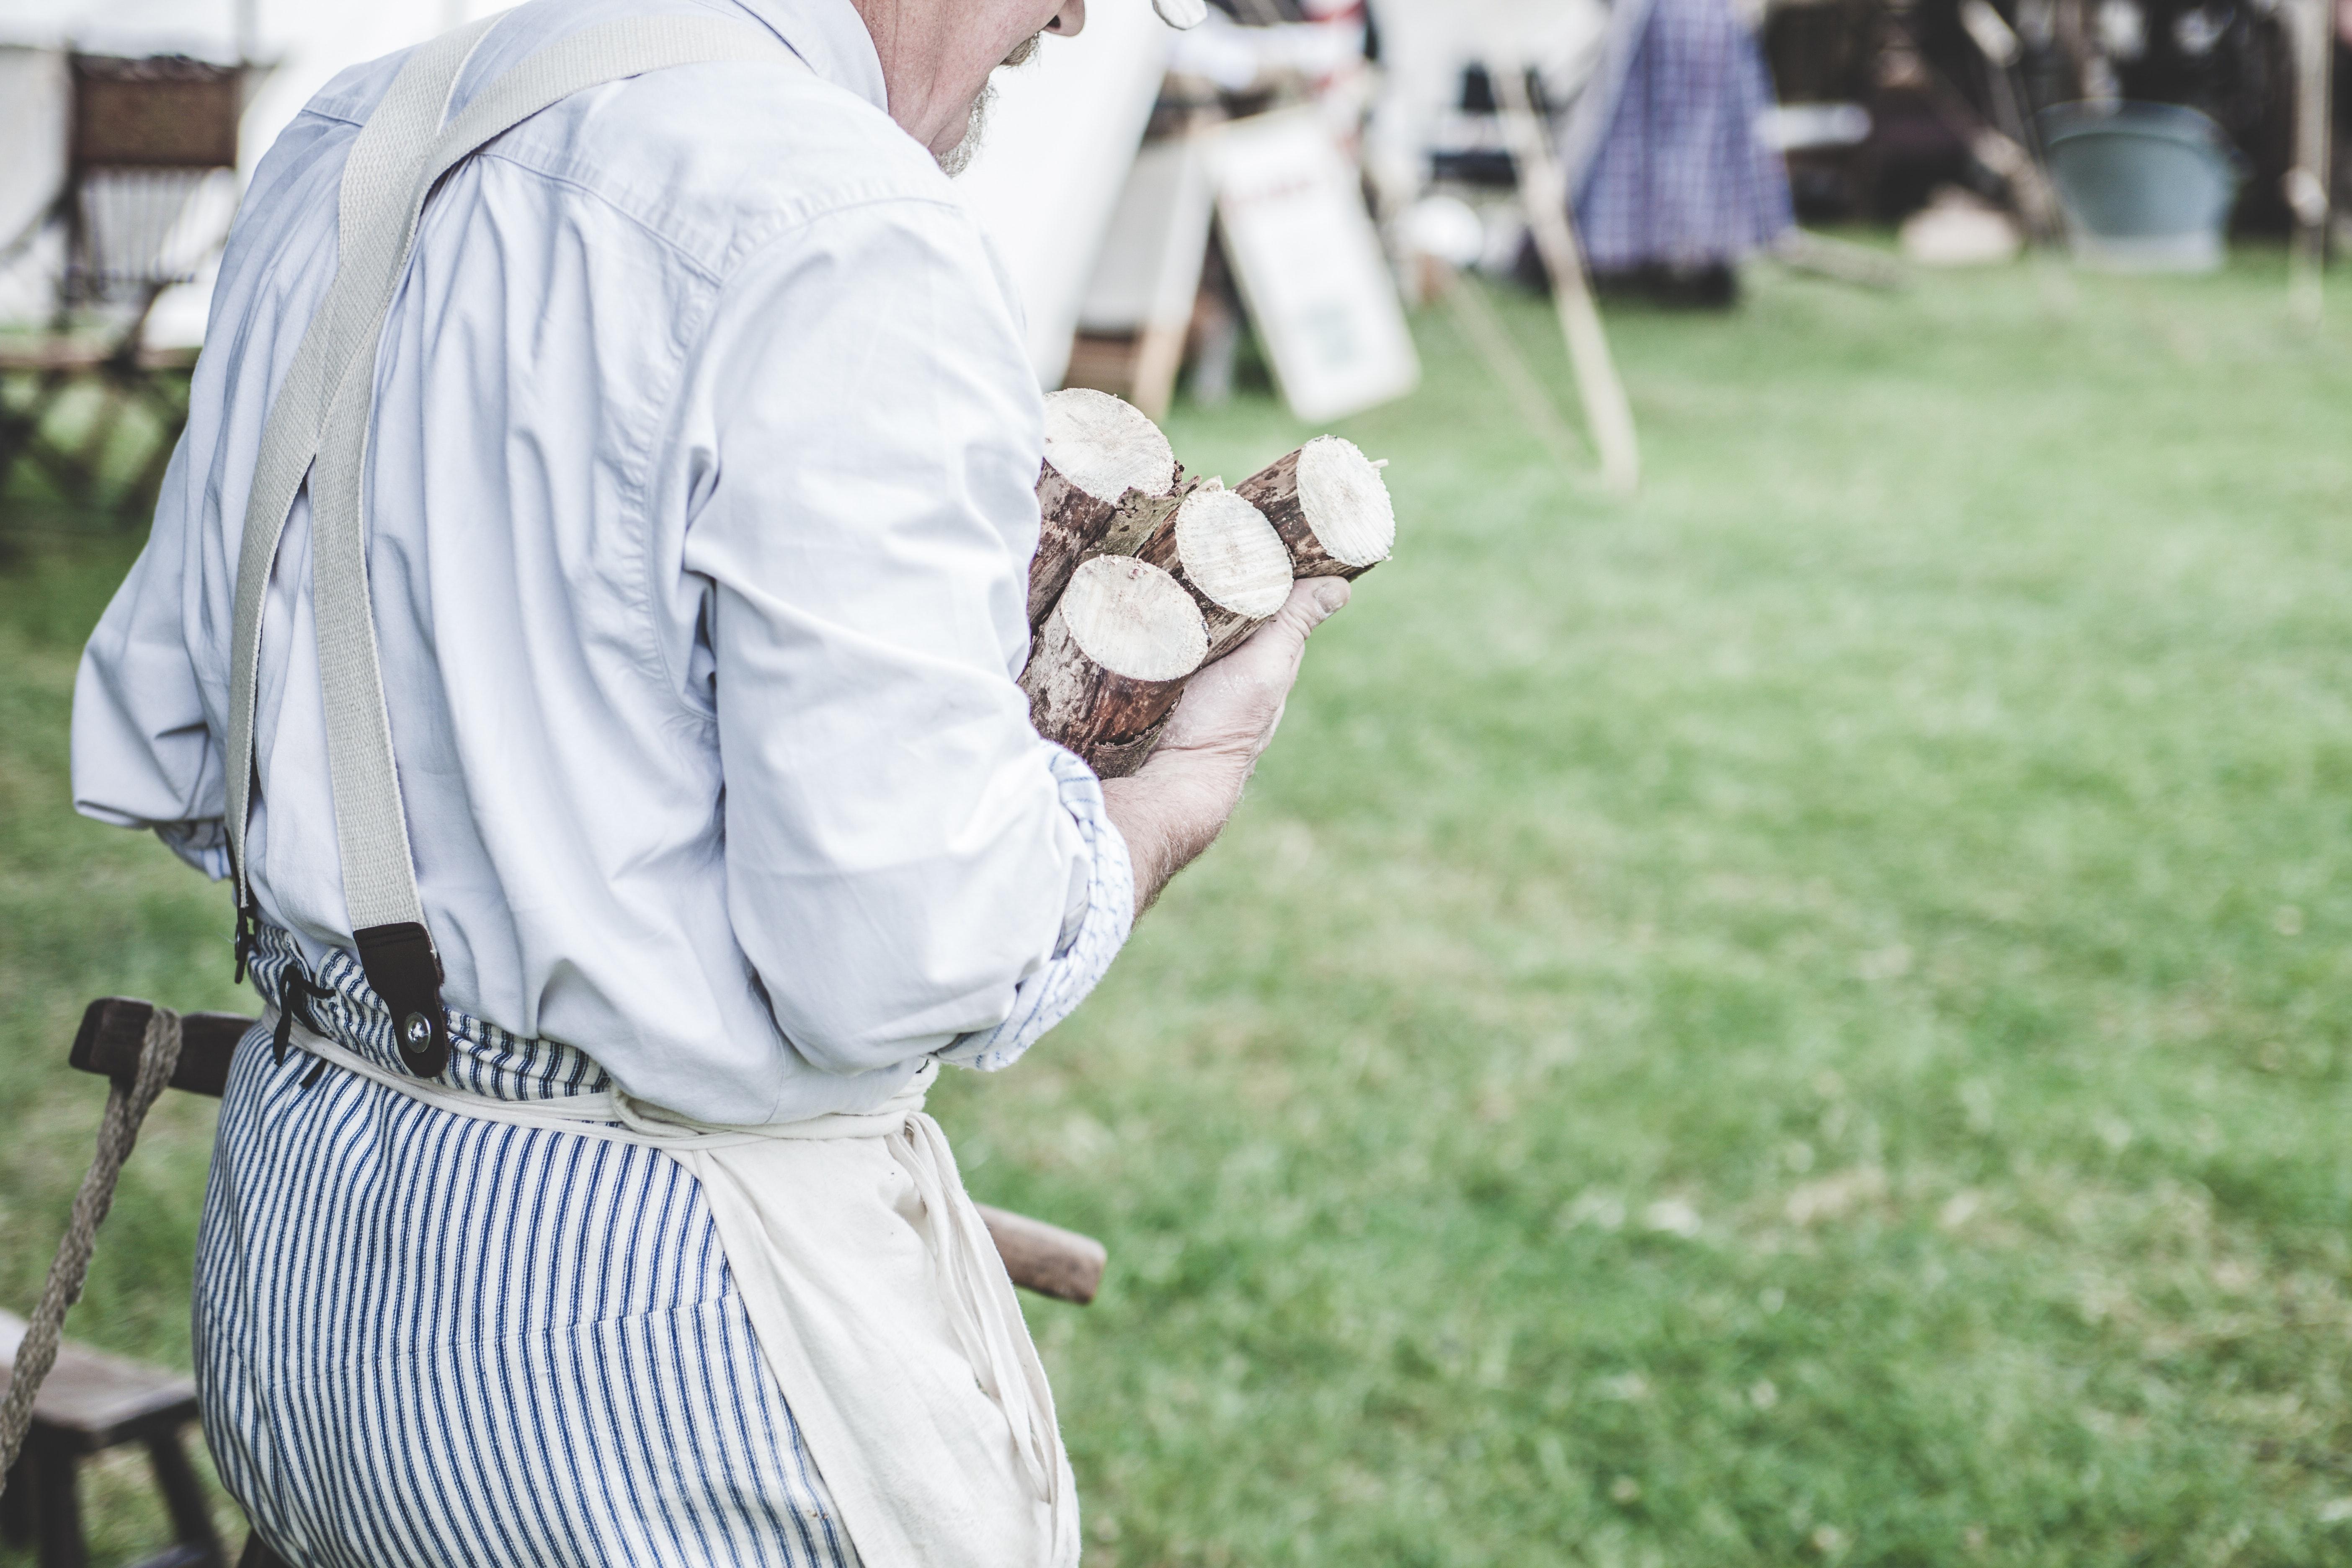 Man in White Dress Shirt Carrying Brown Wood Logs, Grass, Man, Person, Wood logs, HQ Photo